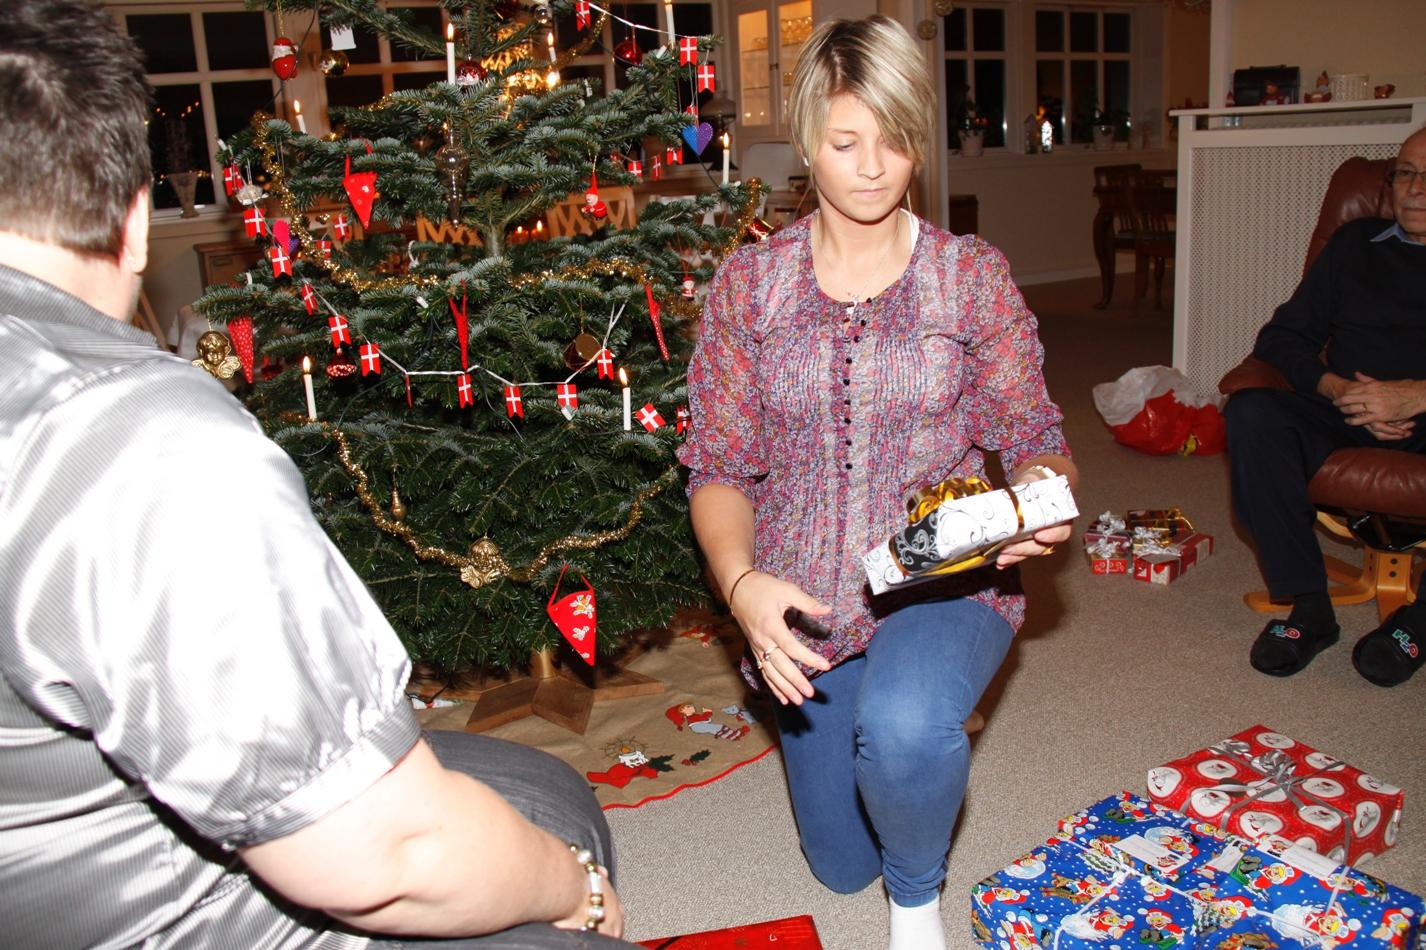 IMG_6374 JULEAFTEN 24-12-2008 (36)